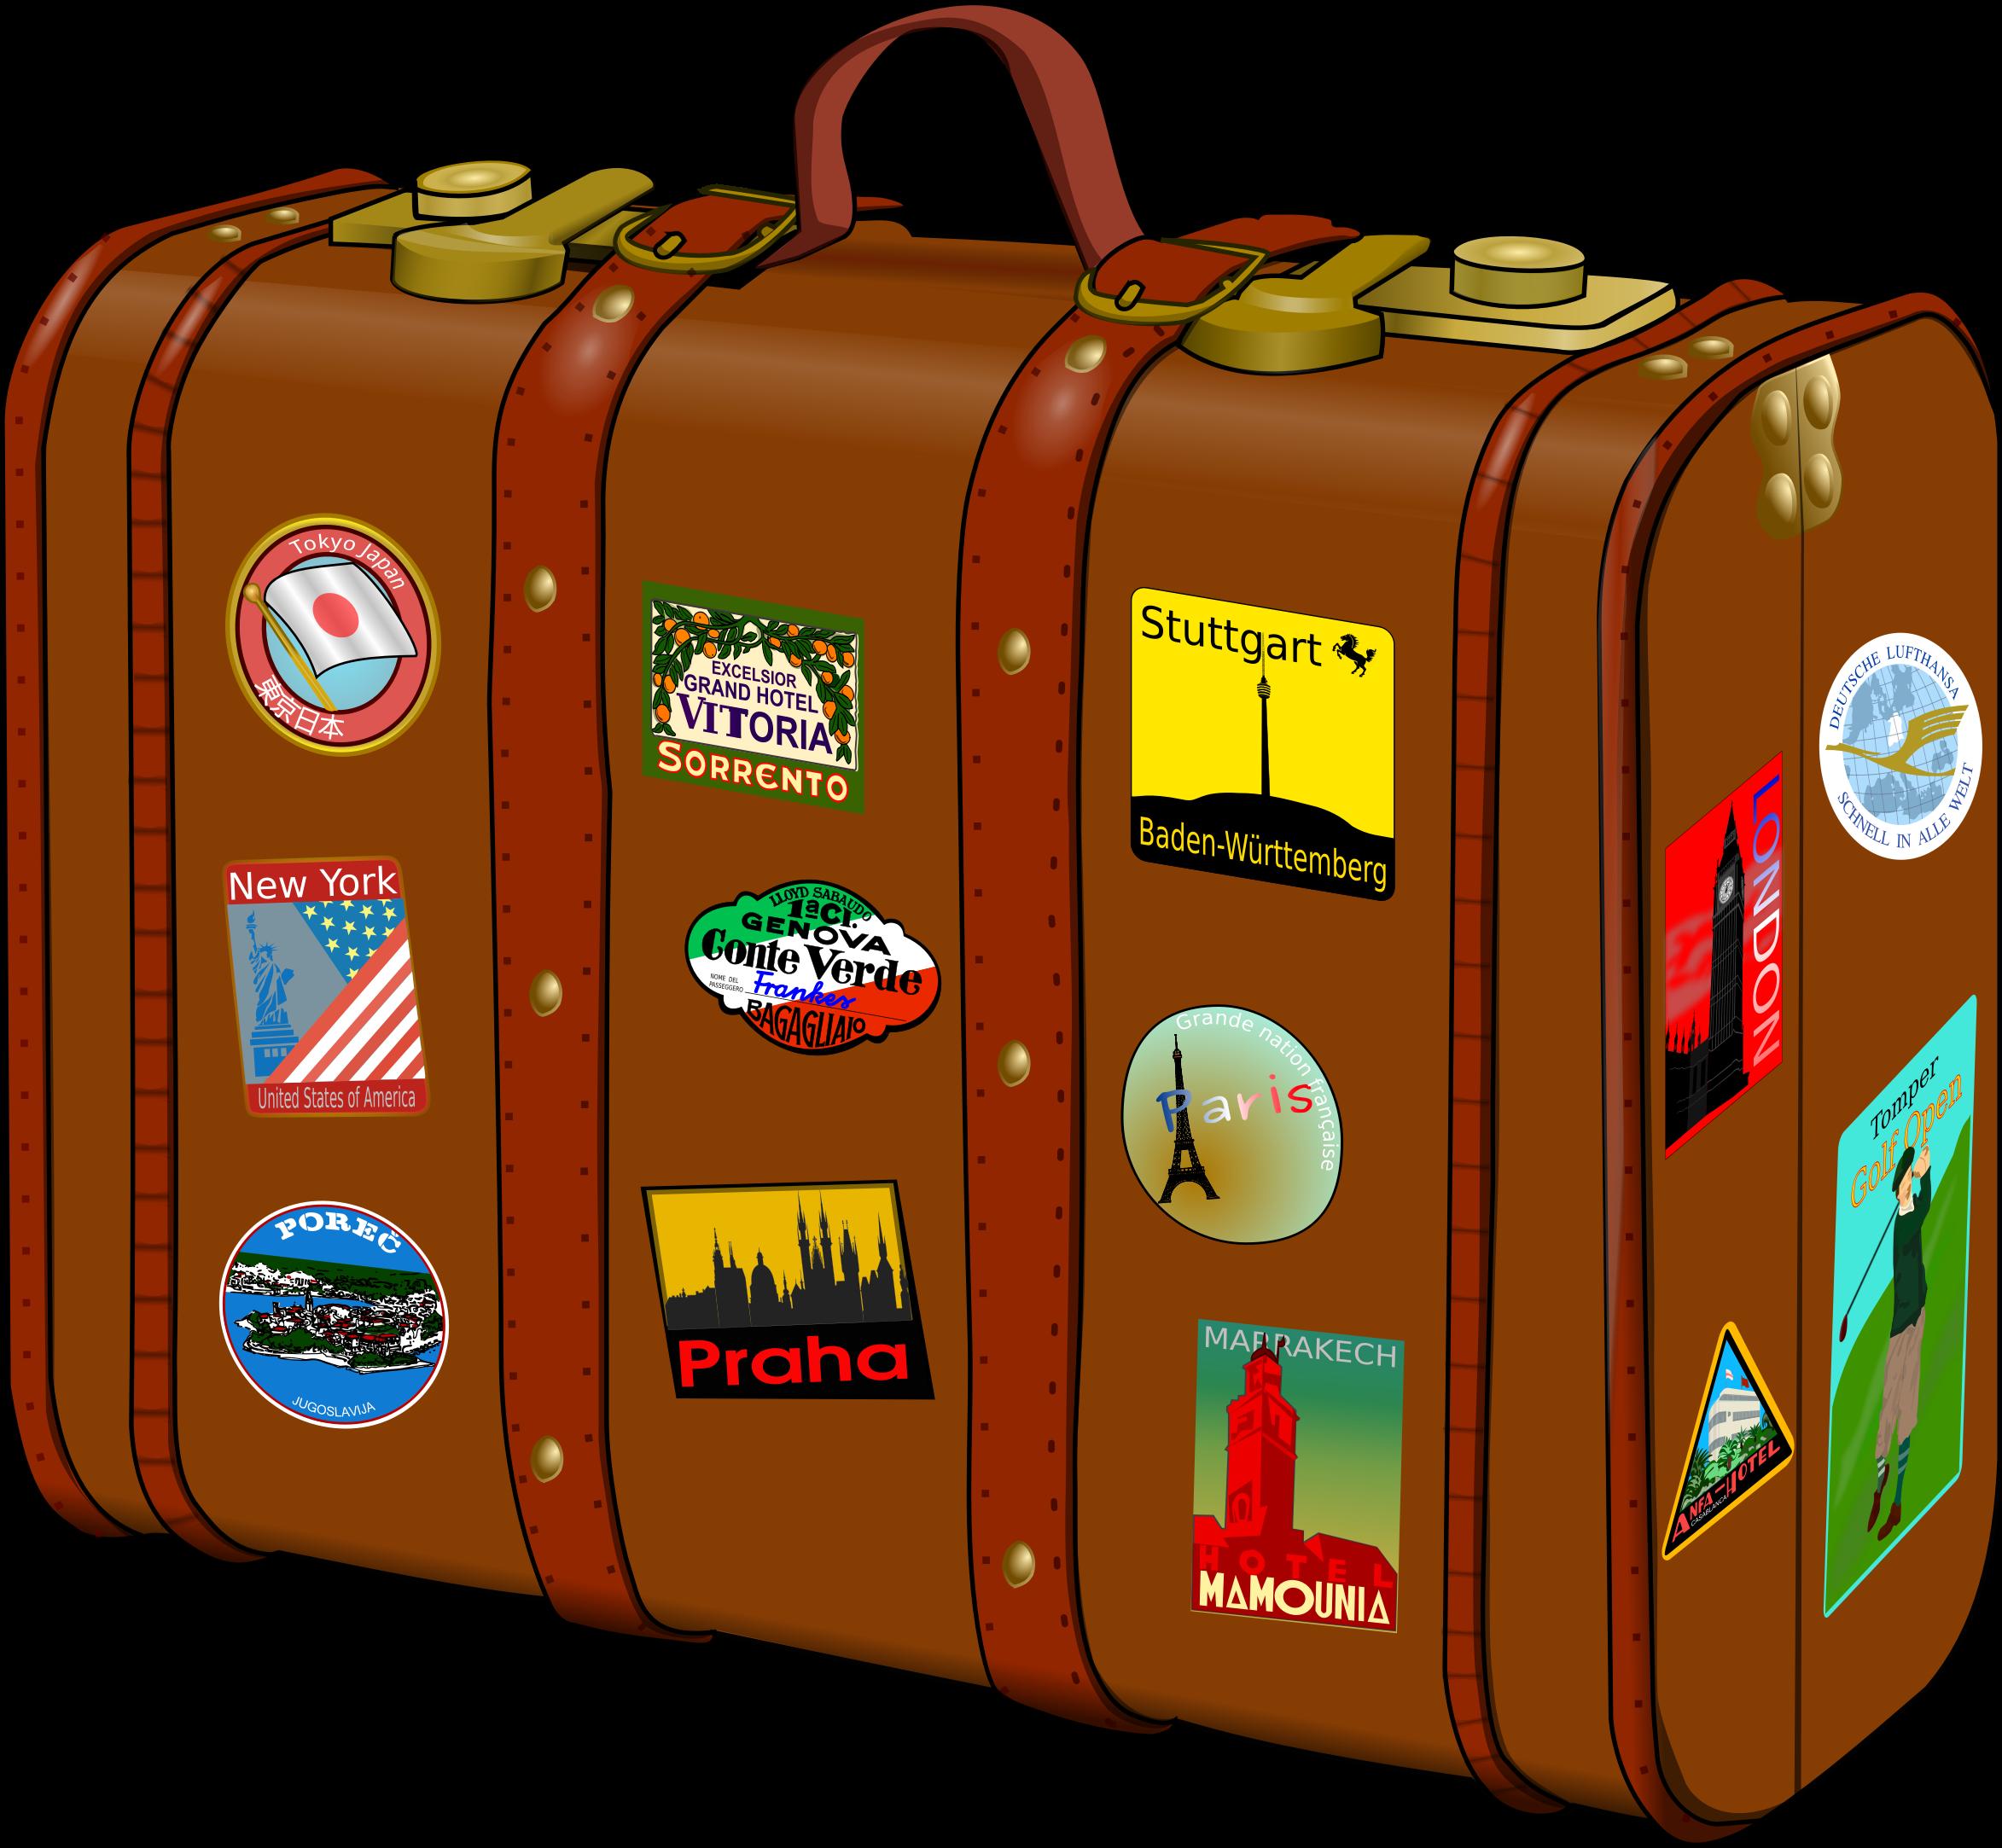 Travel clipart holiday suitcase KofferV3 Organizing Organizer Suitcase! Professional